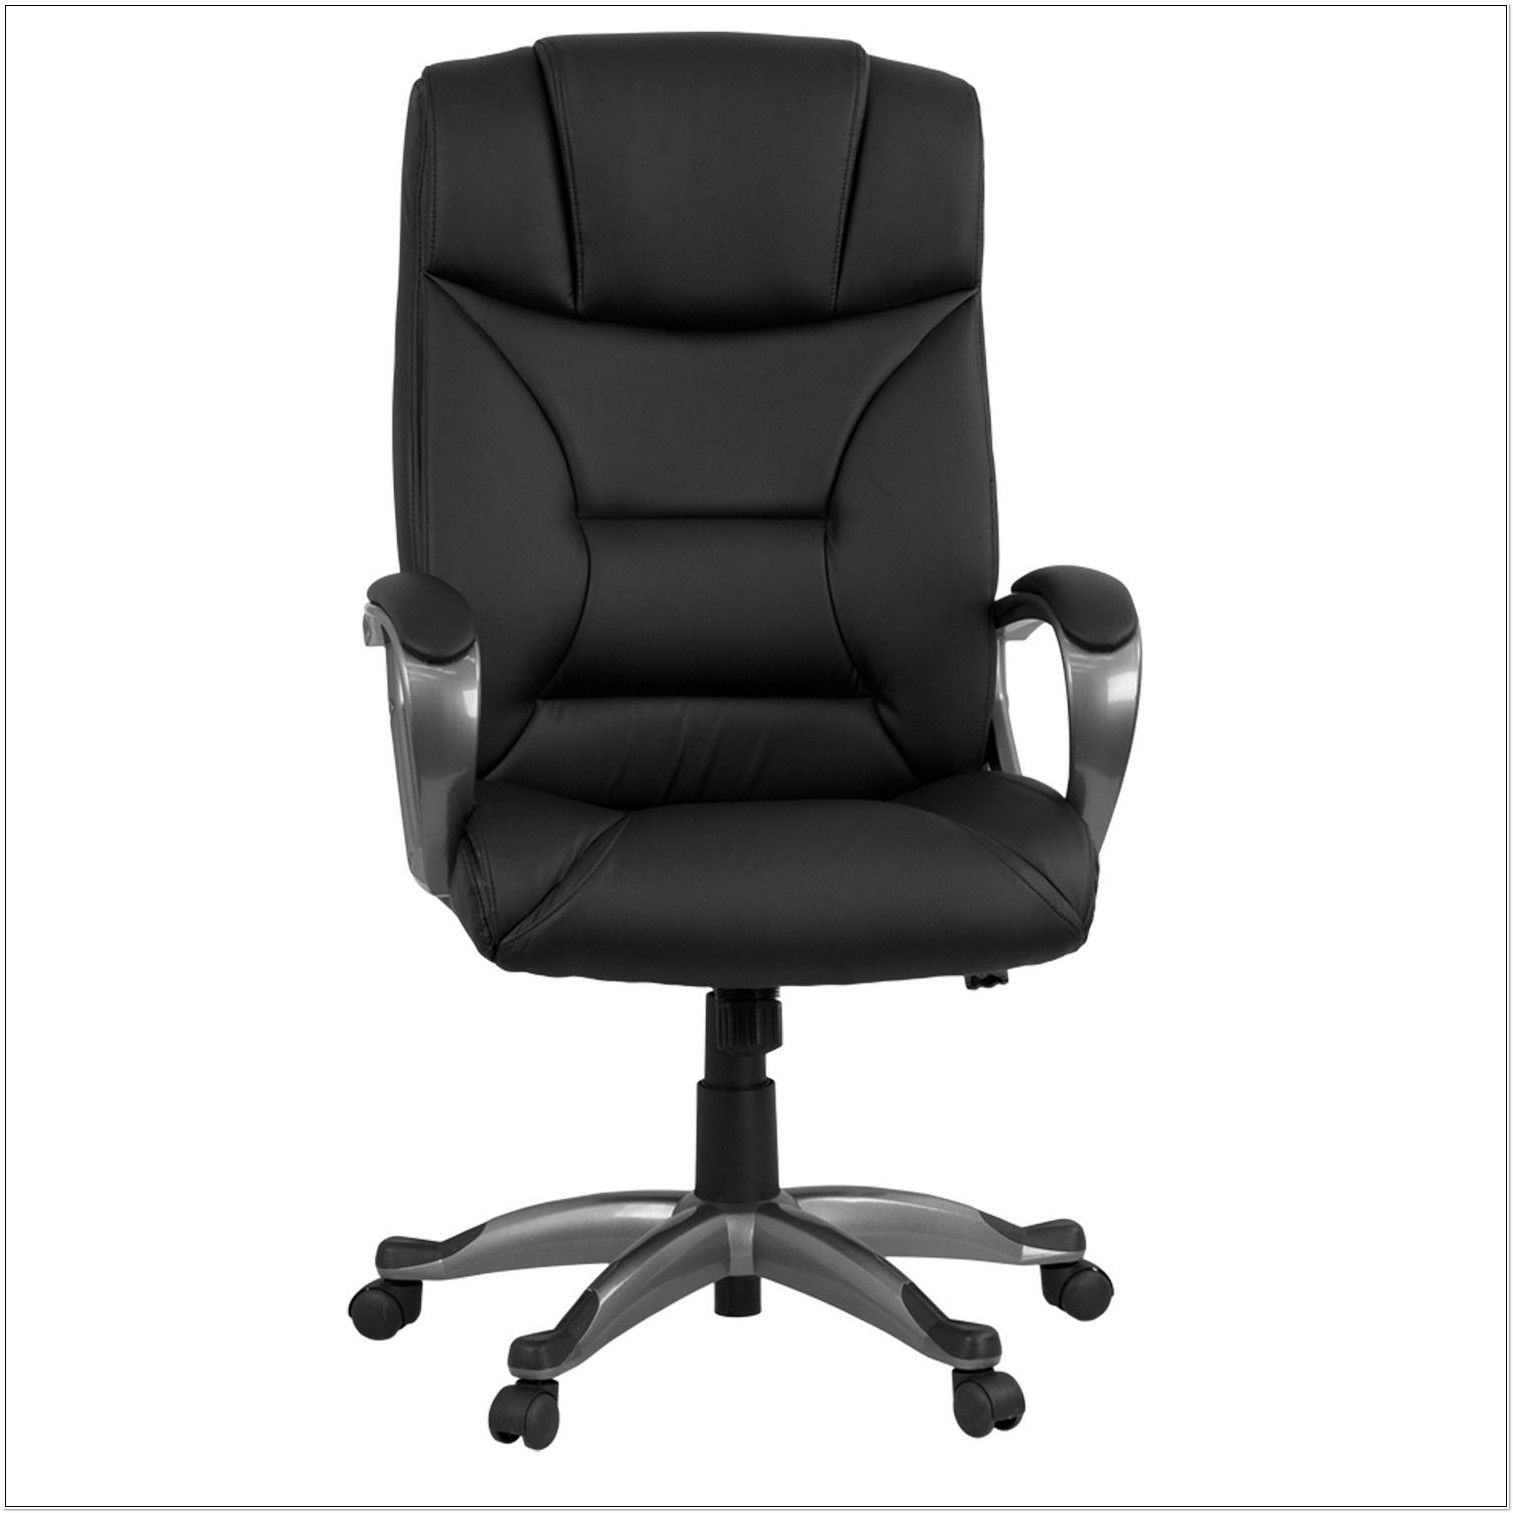 Swinton Avenue Trading Chair